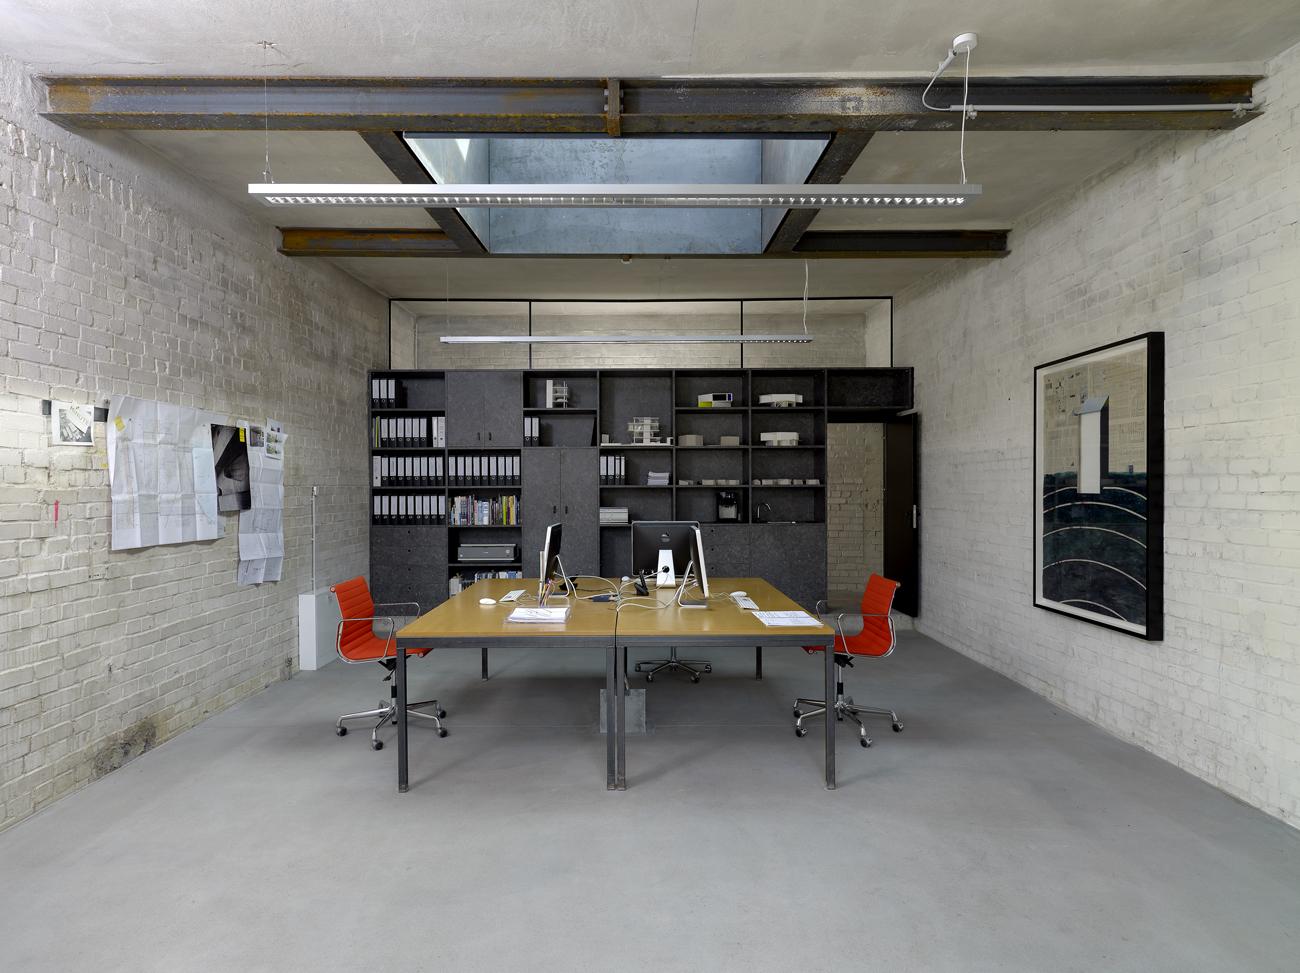 atelier-anselm-reyle-6-tanja-lincke-architekten